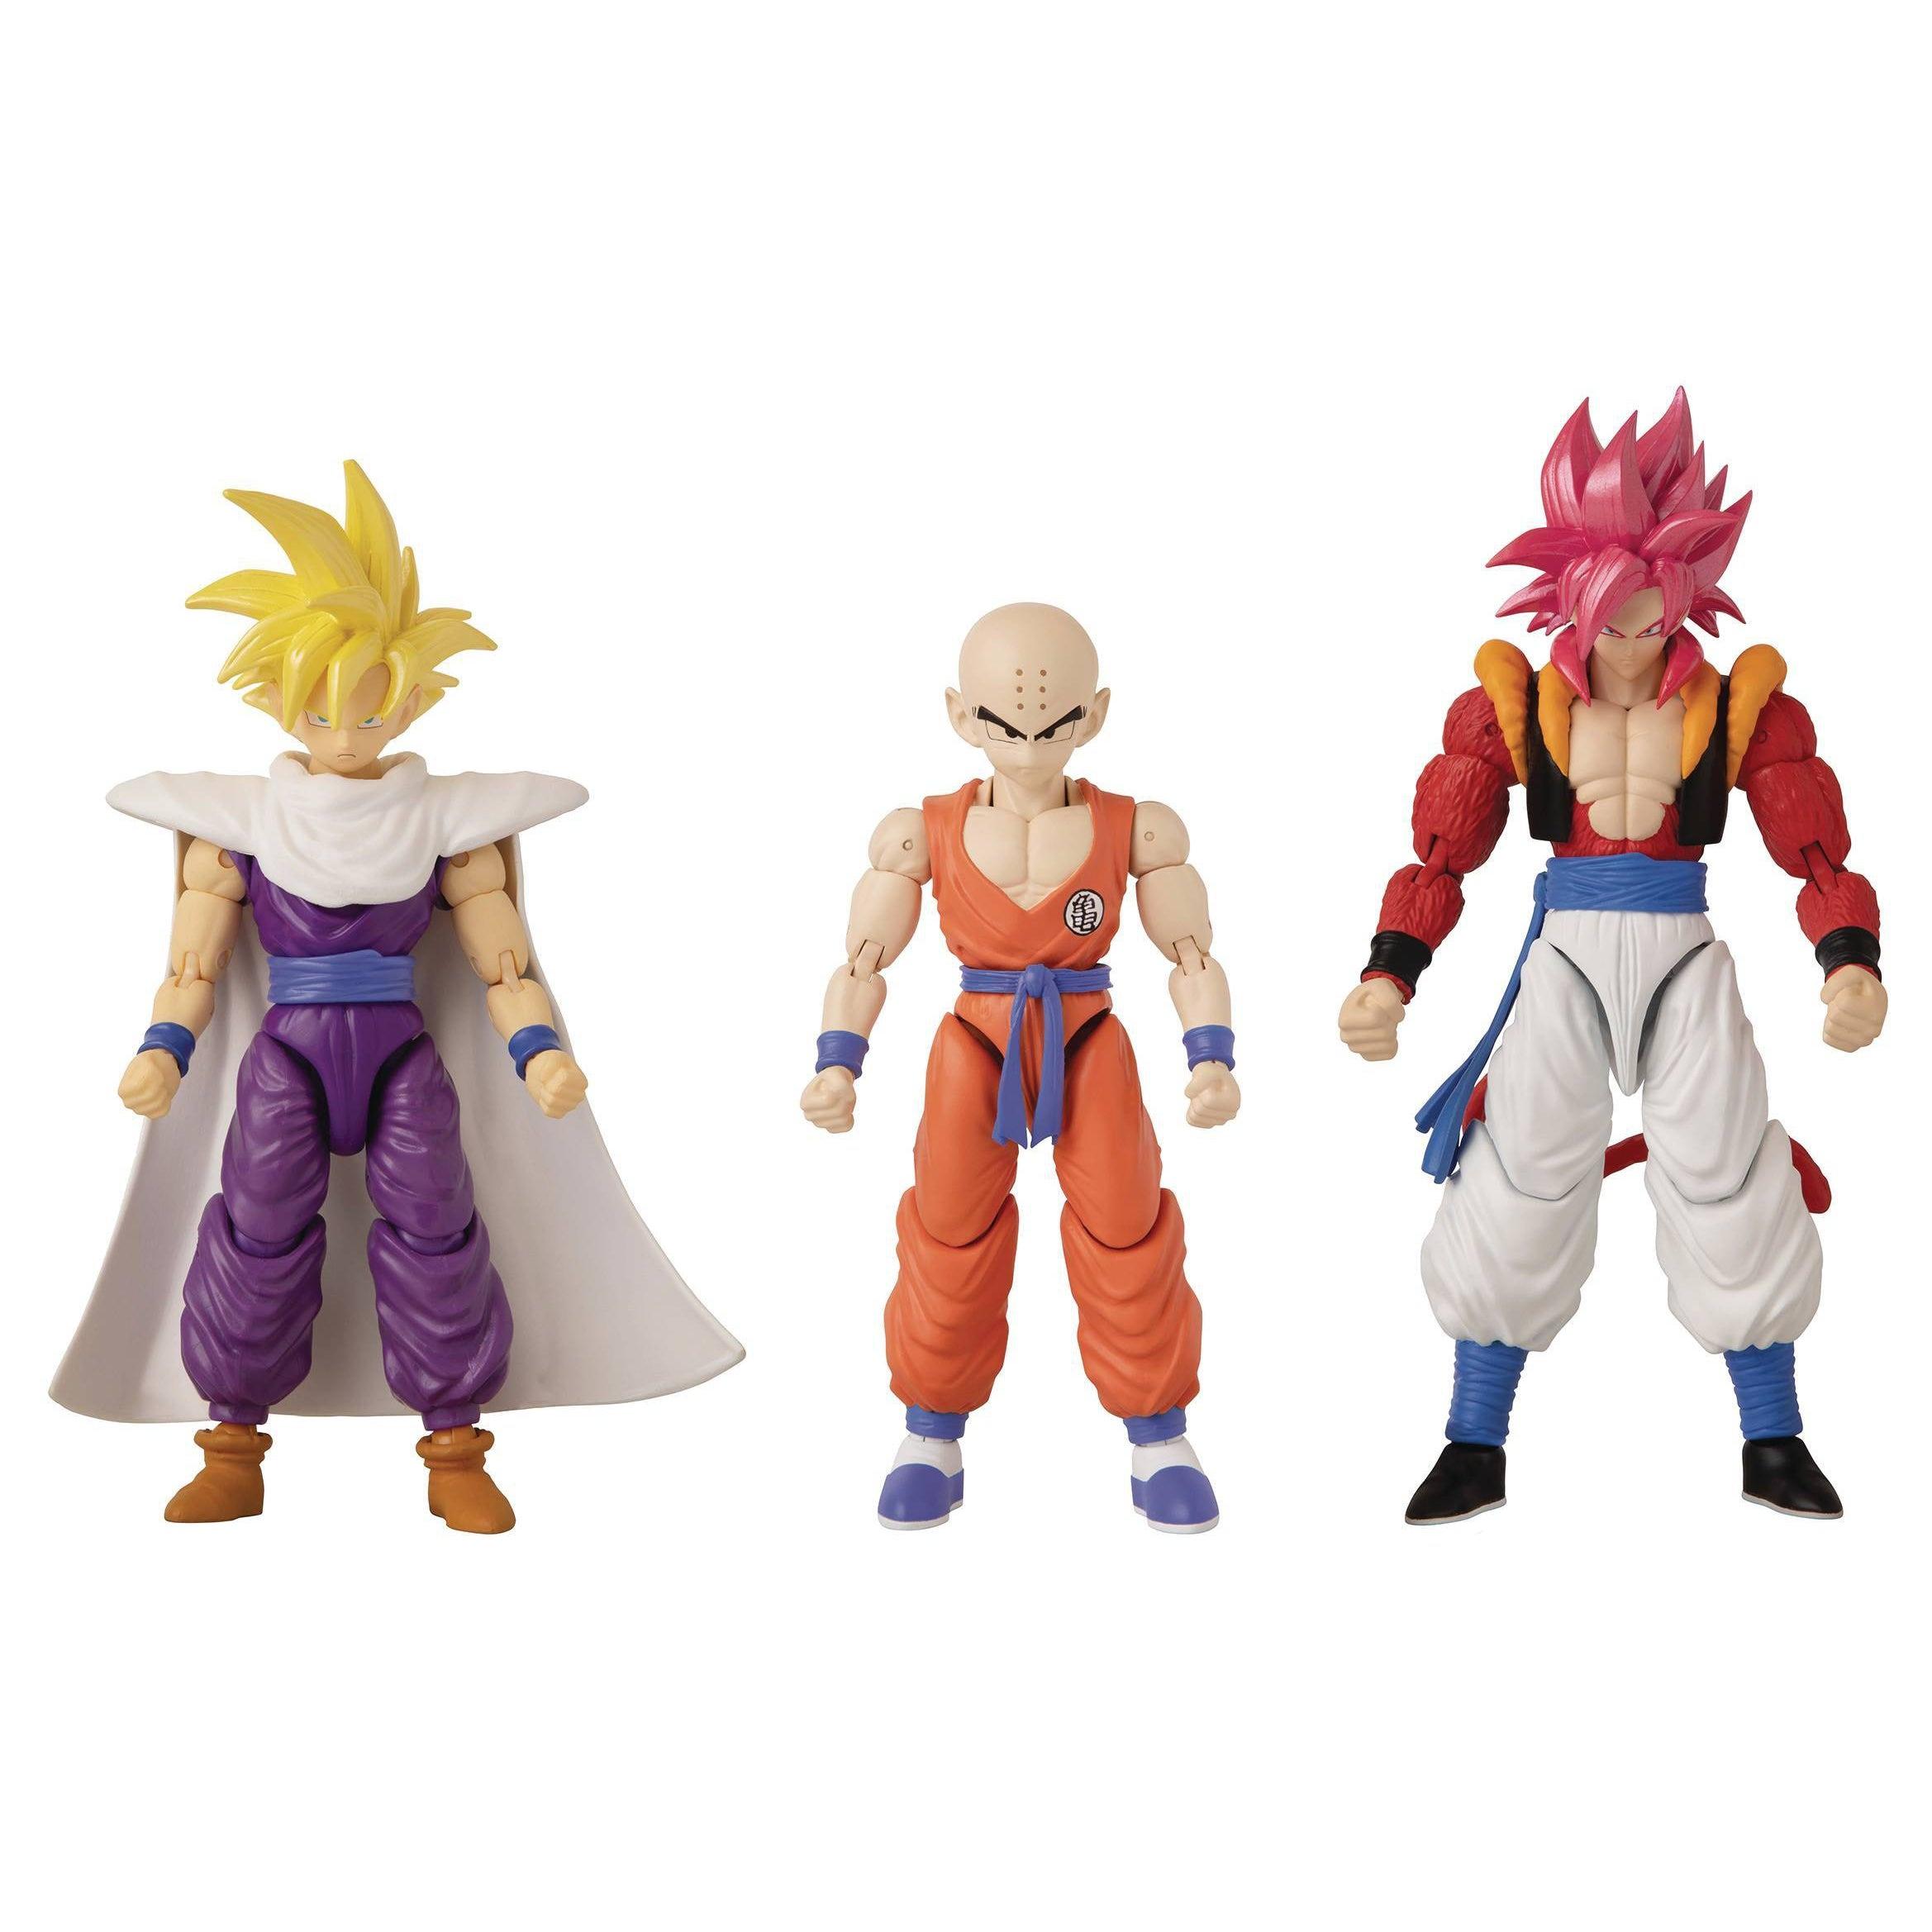 Image of Dragon Ball Dragon Stars Wave 14 Set of 3 Figures - FEBRUARY 2020